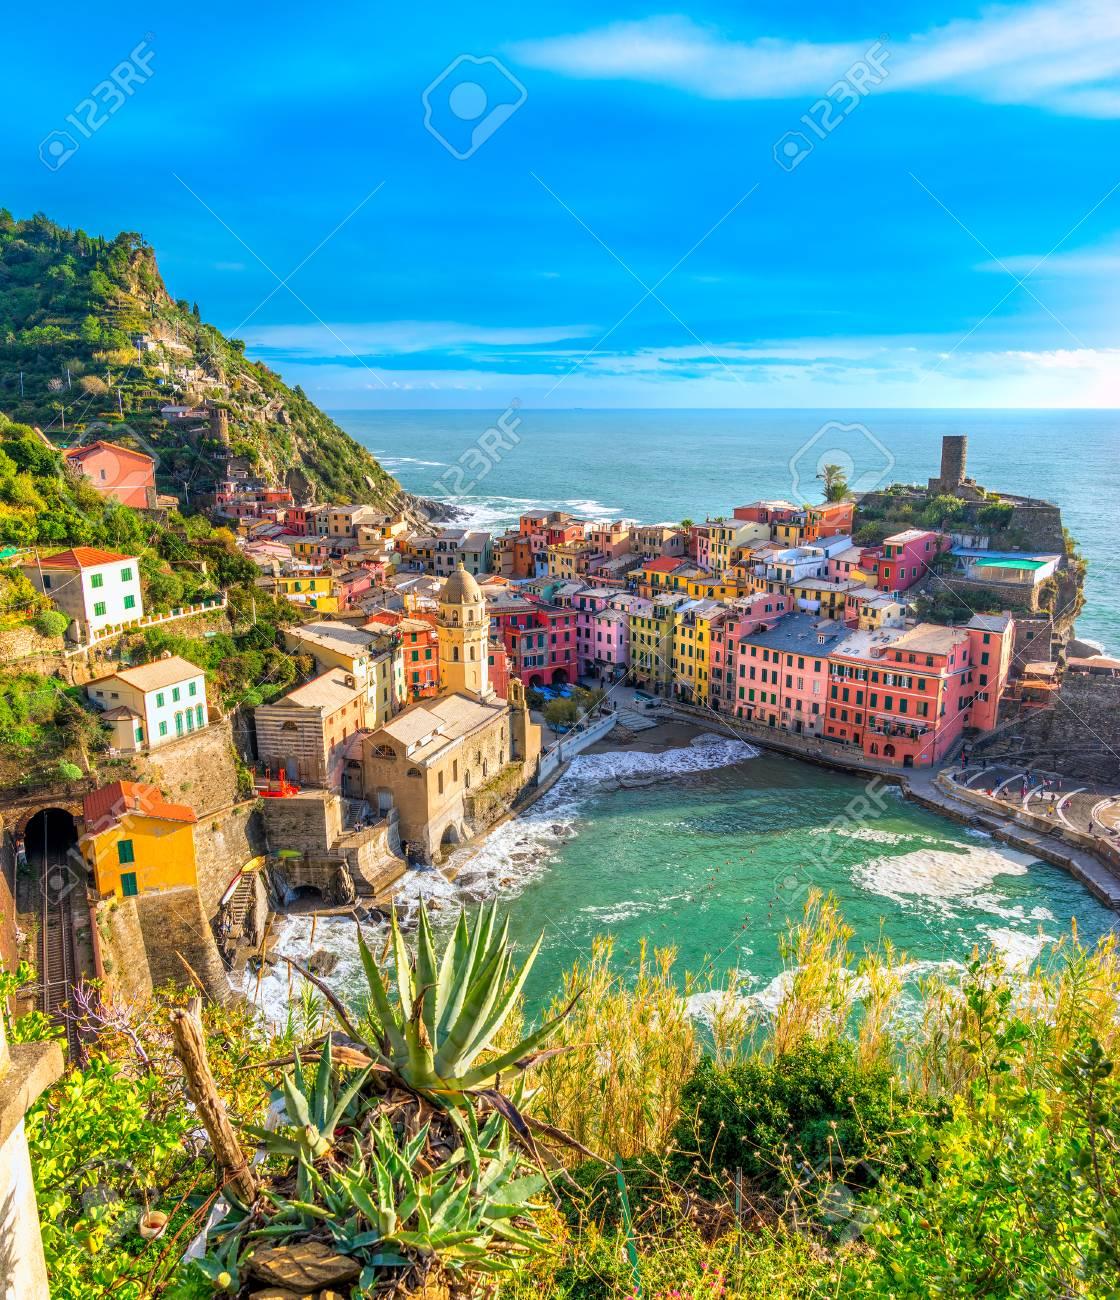 Vernazza fishing village, seascape in Five lands, Cinque Terre National Park, Liguria, Italy. - 71896348